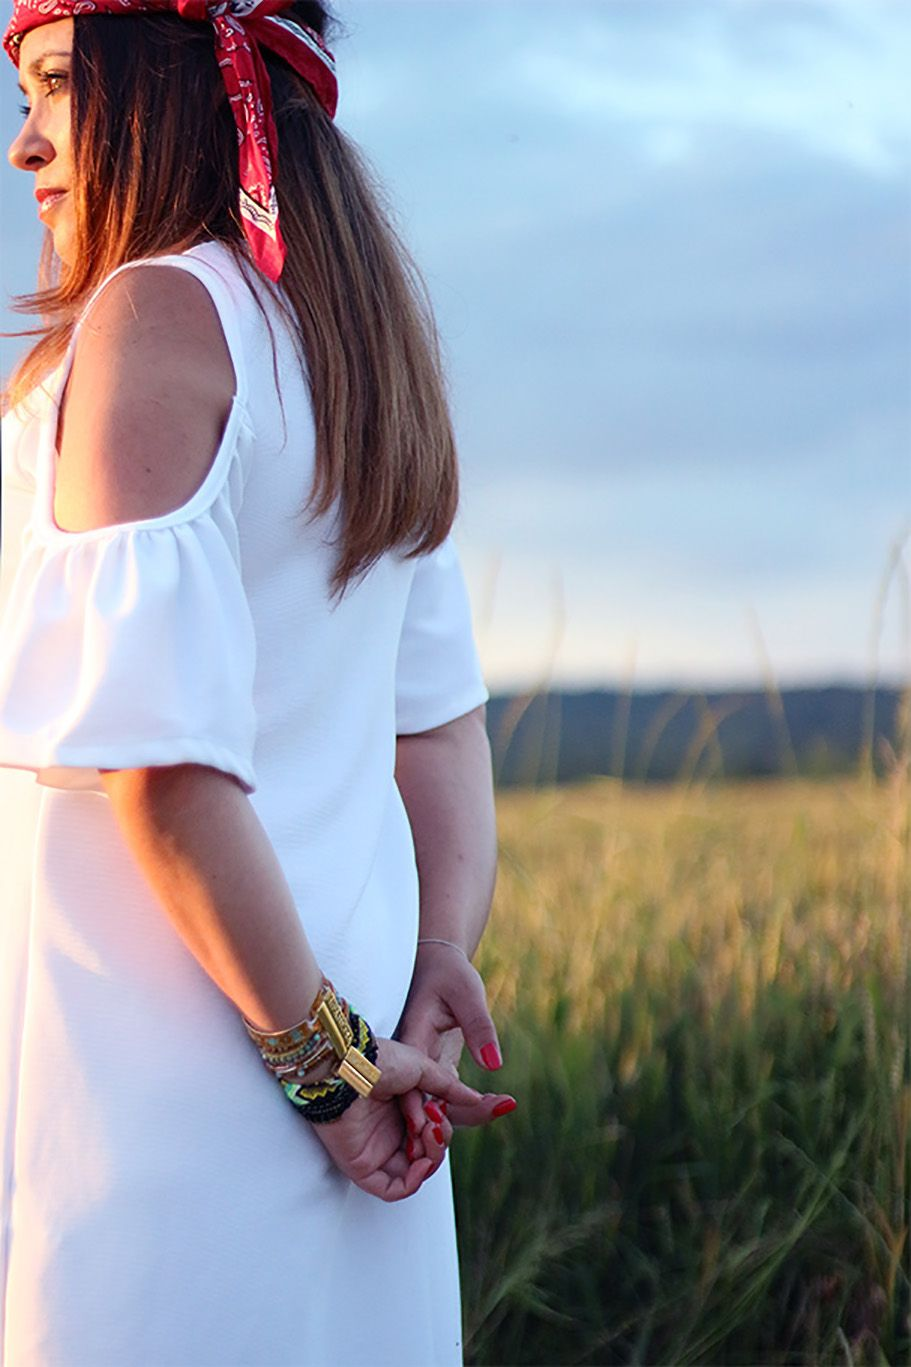 robe blanche, robe zara, col bardot, bandana, hipanema, pull and bear, sandales compensées, blog mode, blogueuse mode, fashion blogger